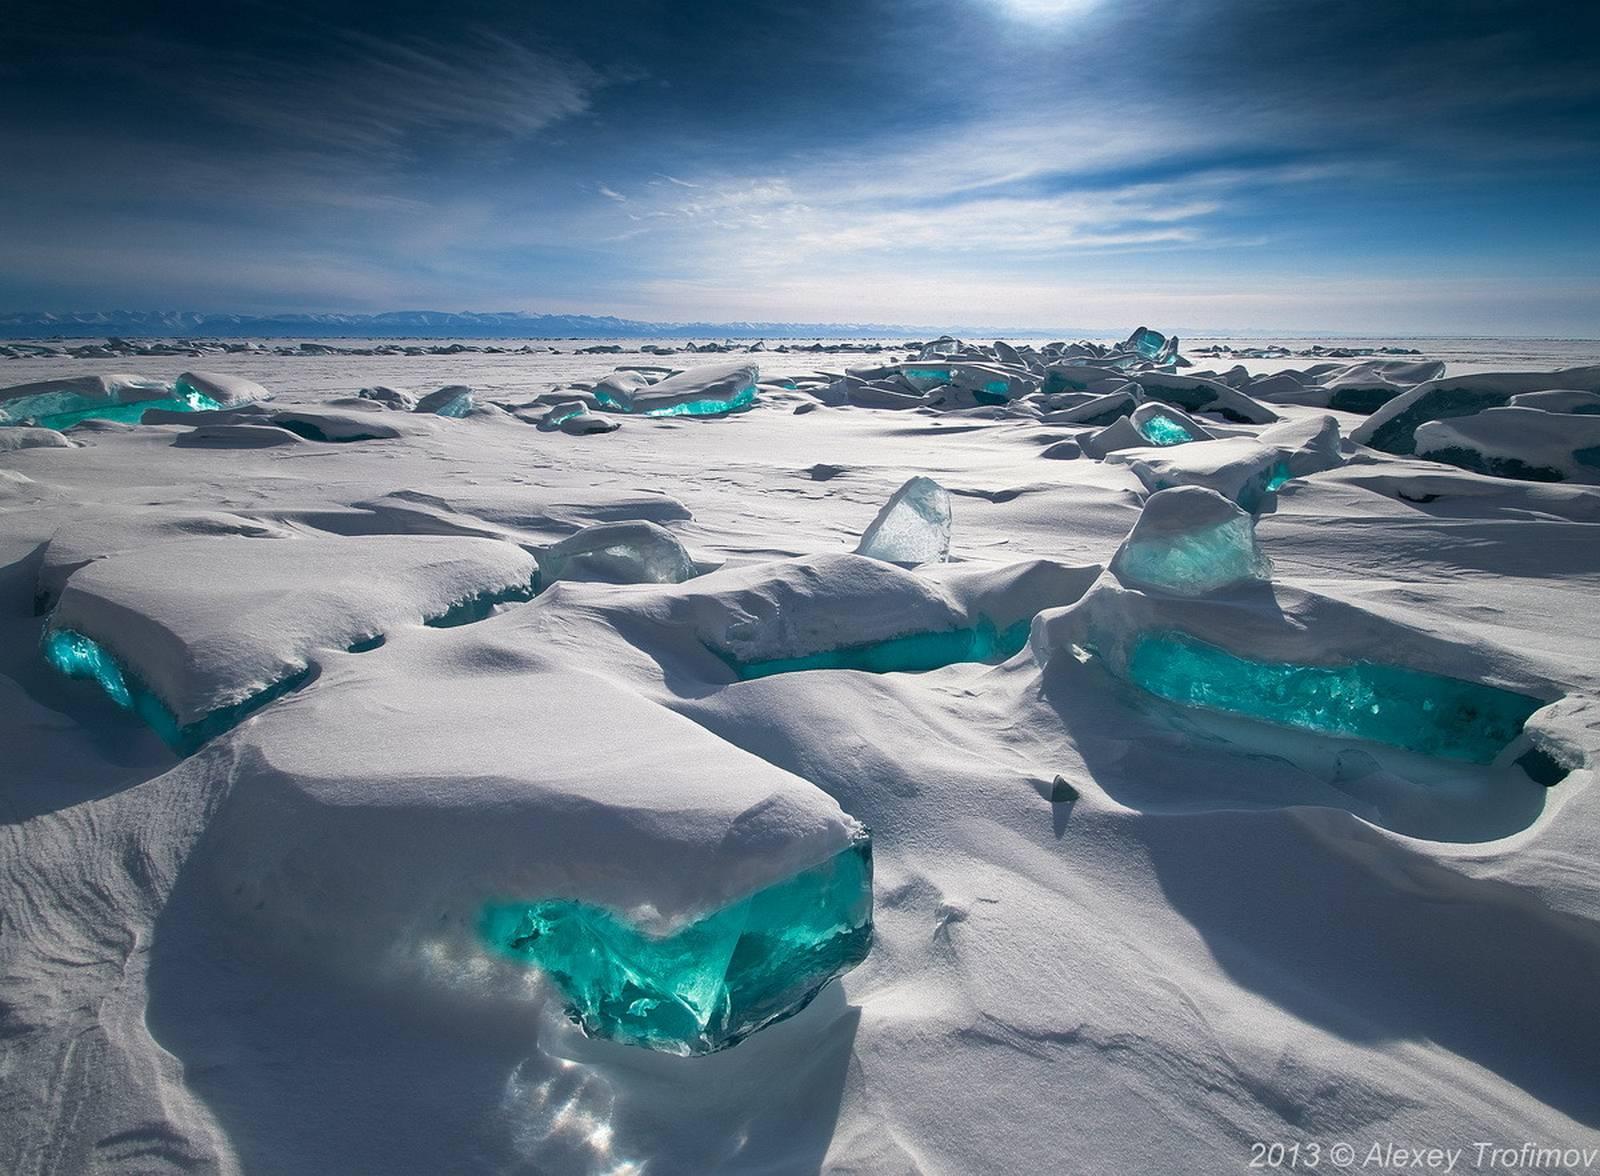 Lake Baikal - Frozen North Siberia